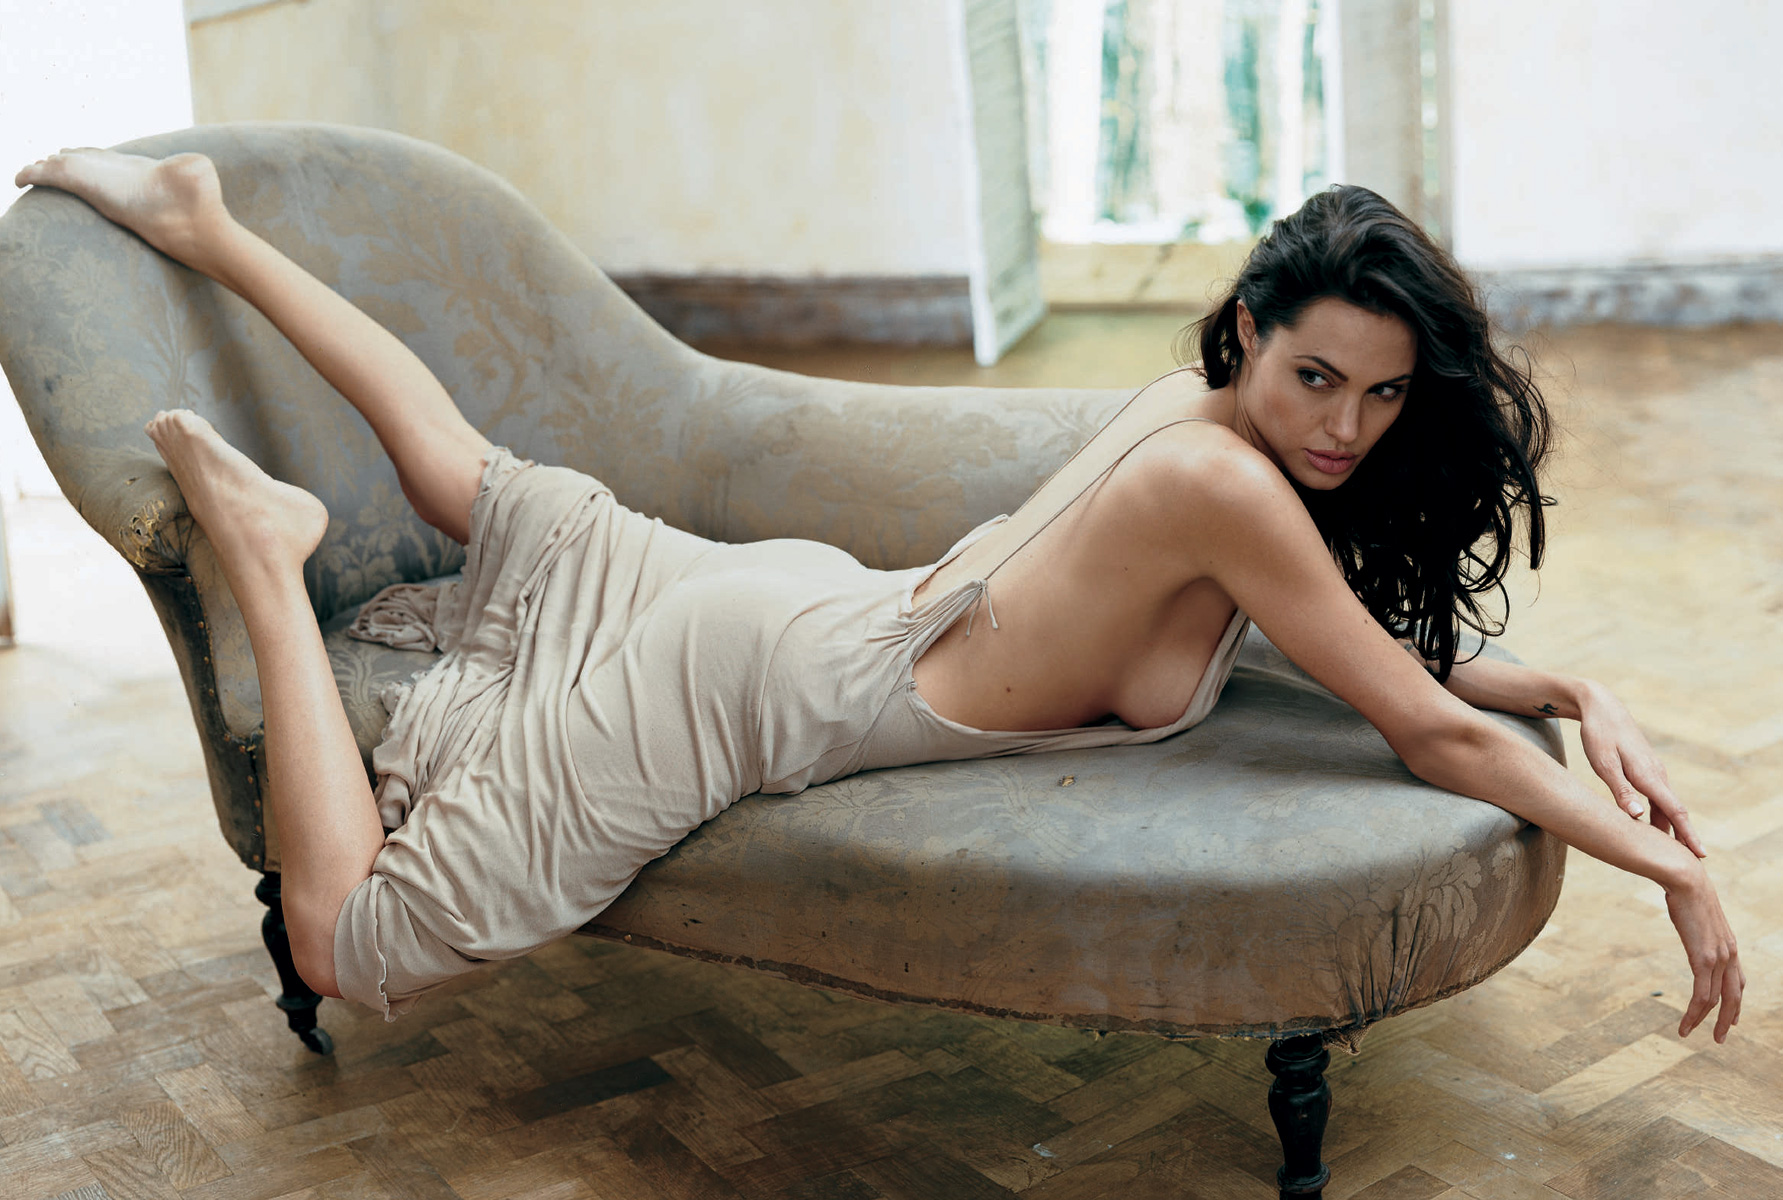 Bons Rapazes Angelina Jolie 40 anos 11